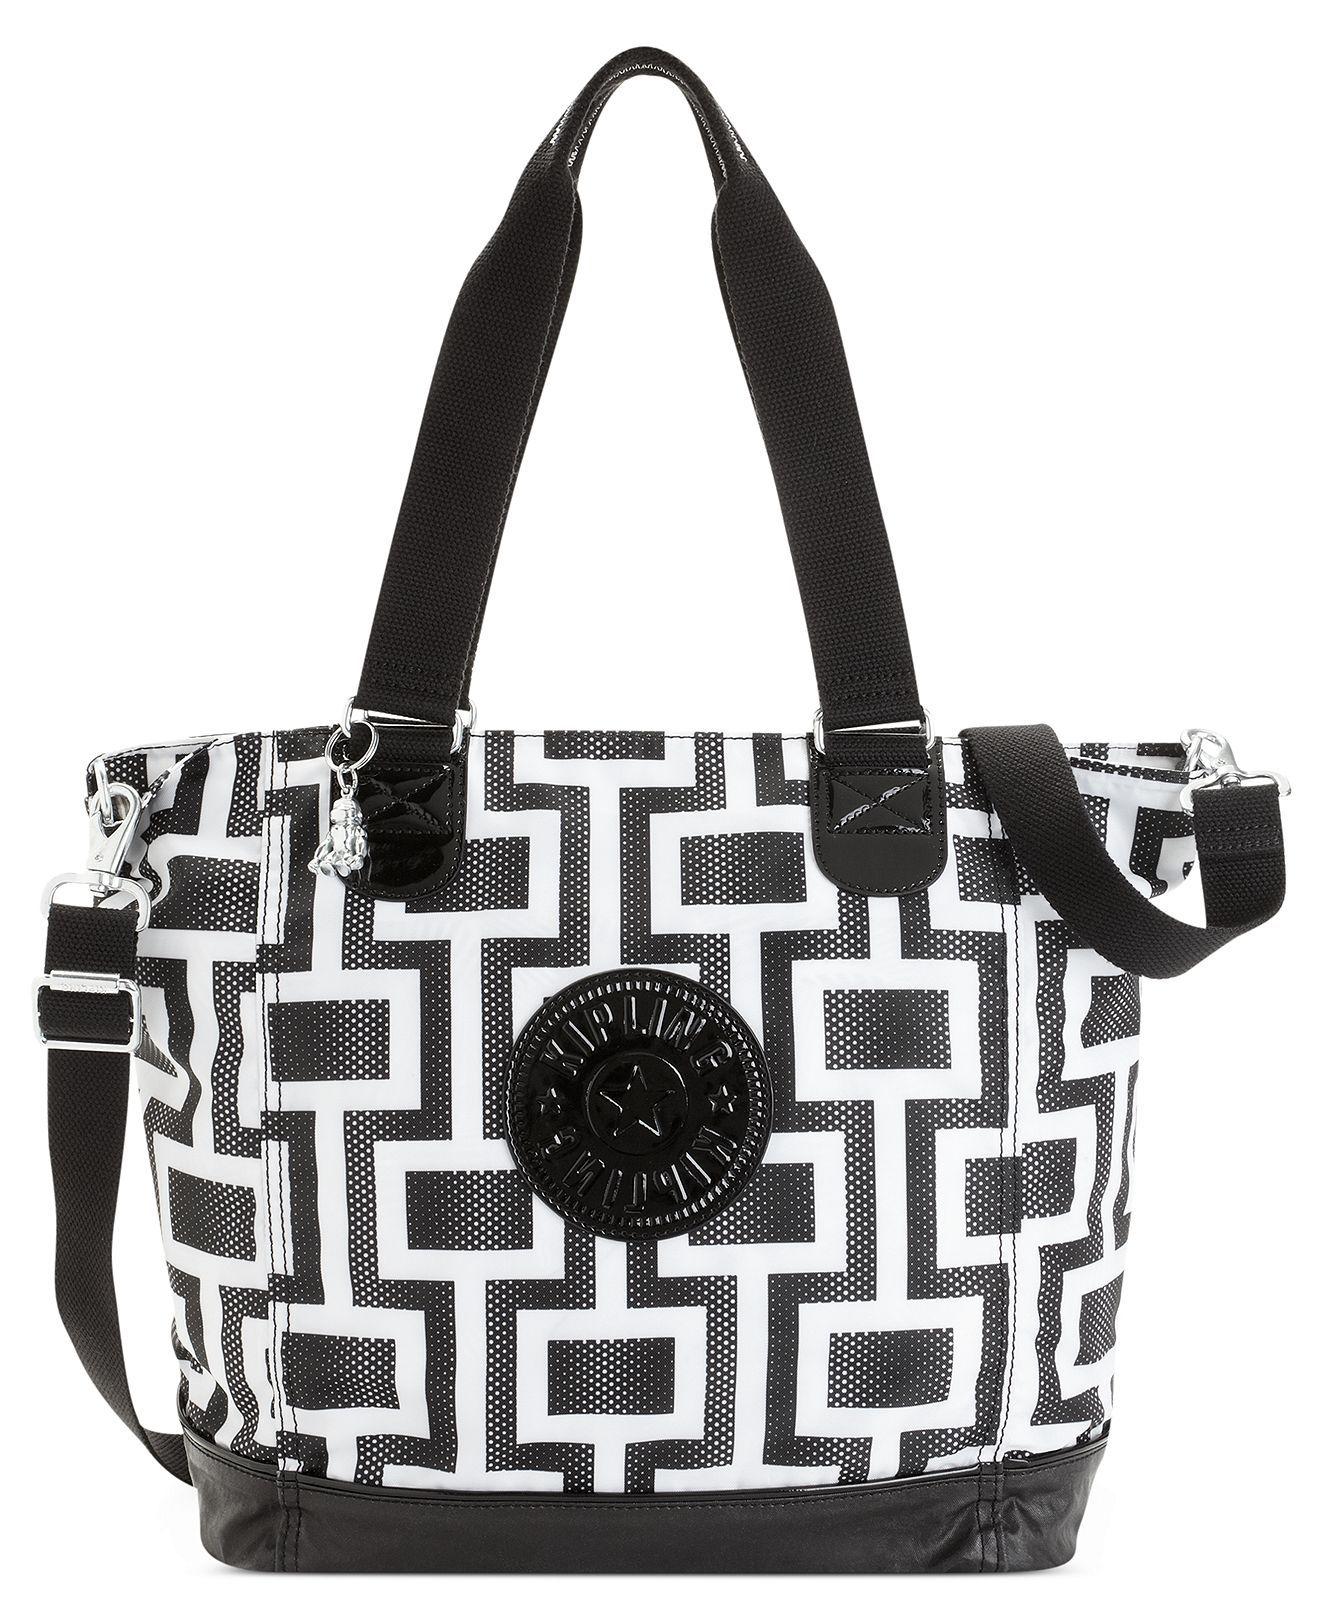 Kipling Handbag Per All Handbags Accessories Macys